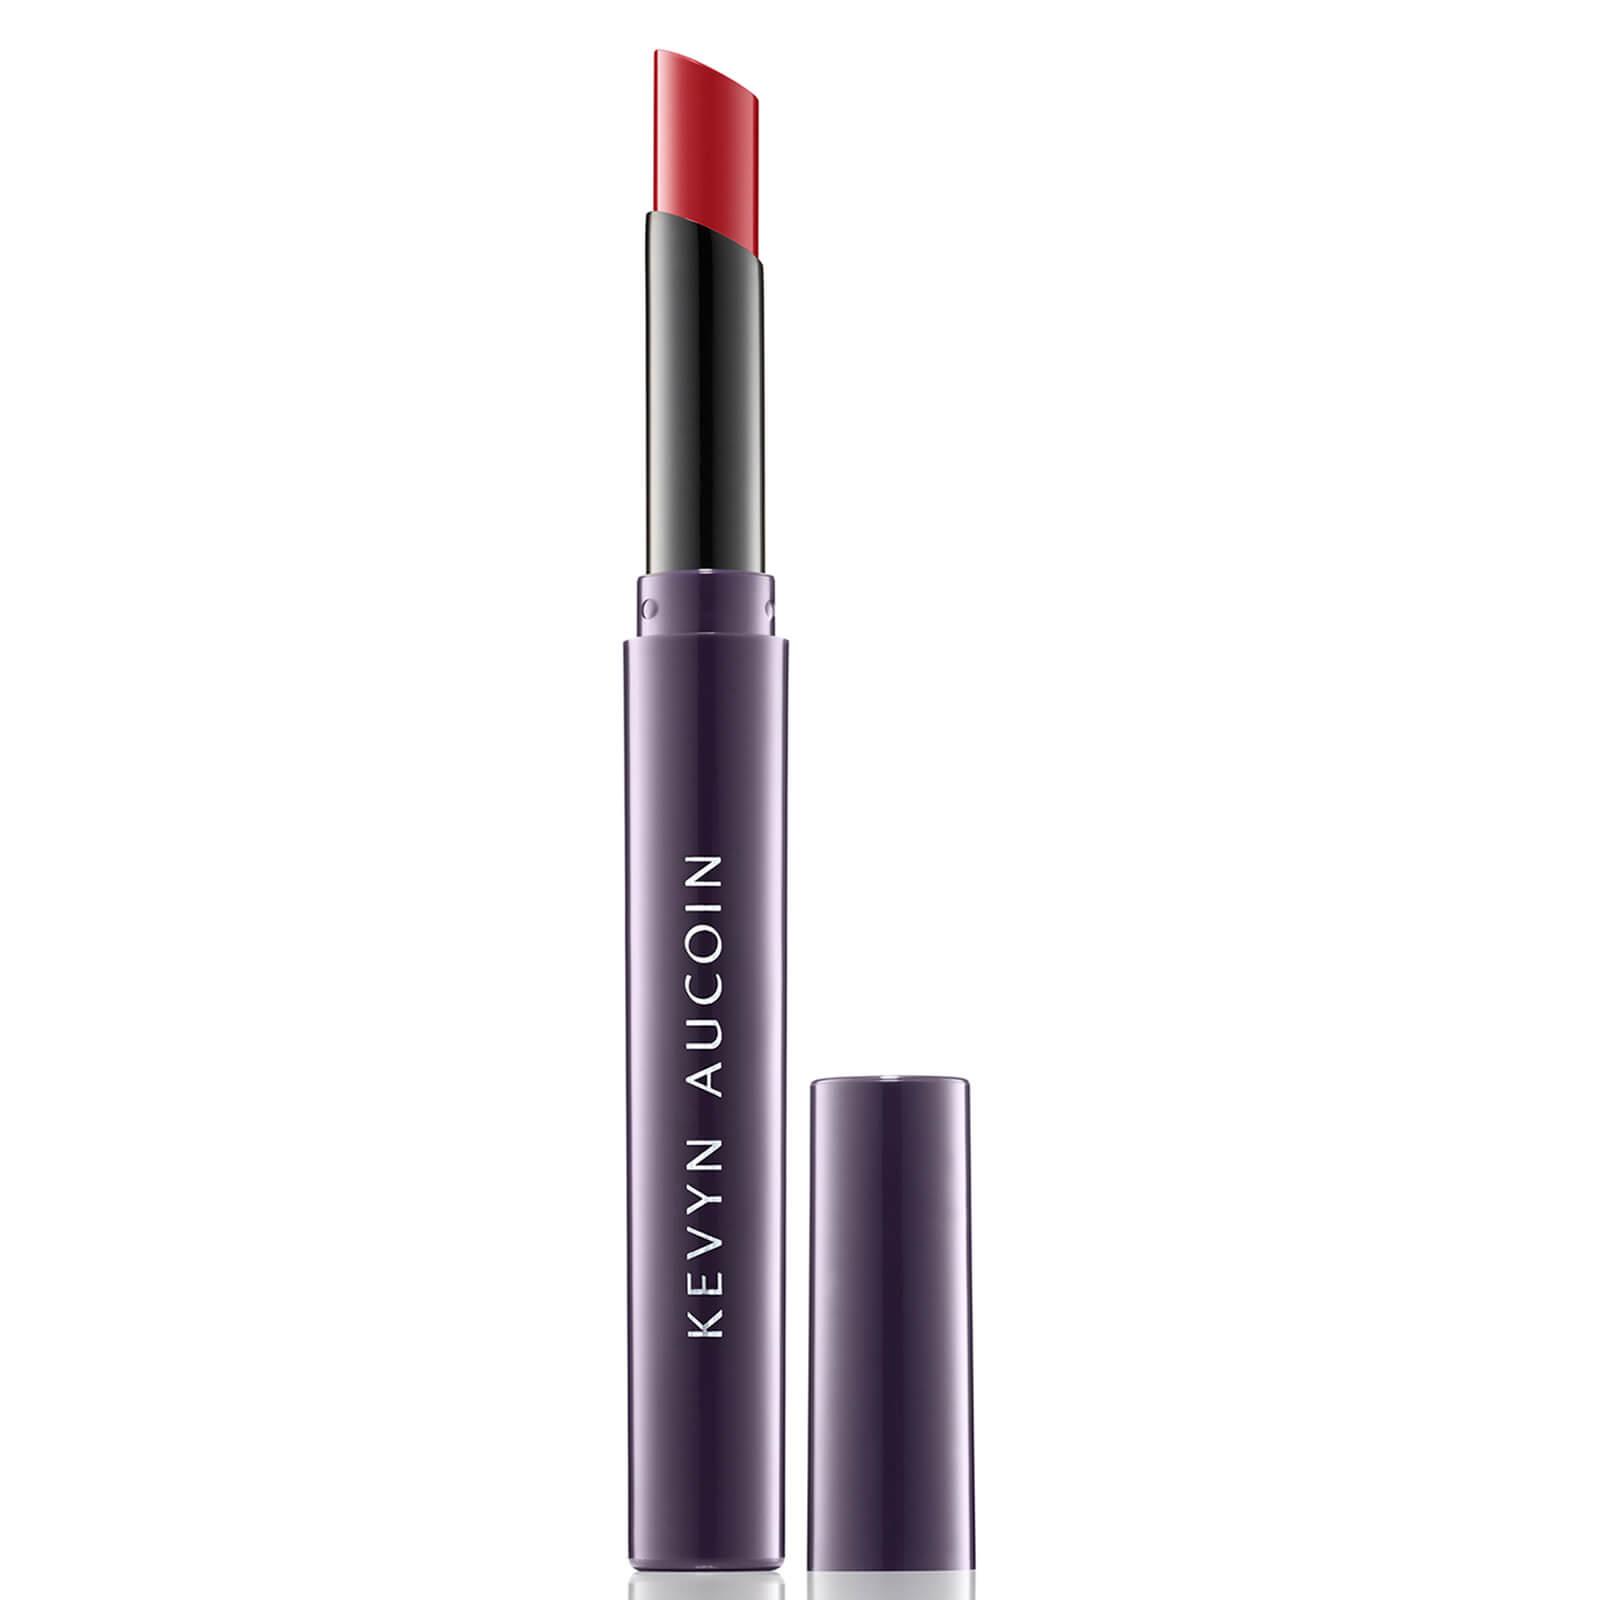 Kevyn Aucoin Unforgettable Lipstick 2g (Various Shades) - Shine - Fatal